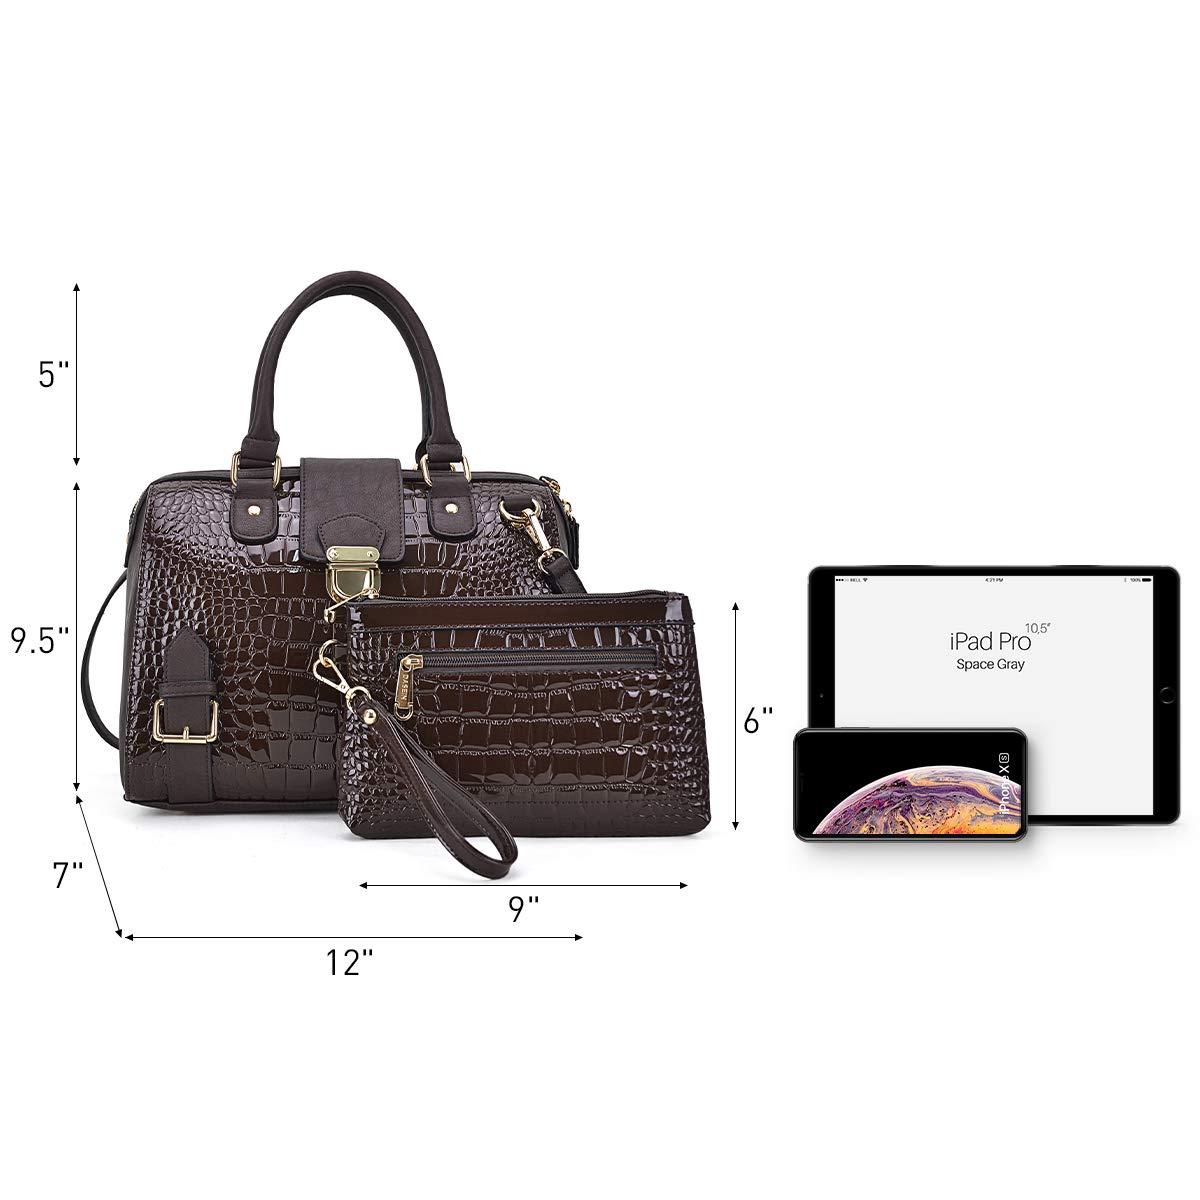 Dasein Women Barrel Handbags Purses Fashion Satchel Bags Top Handle Shoulder Bags Vegan Leather Tote Bags by Dasein (Image #5)